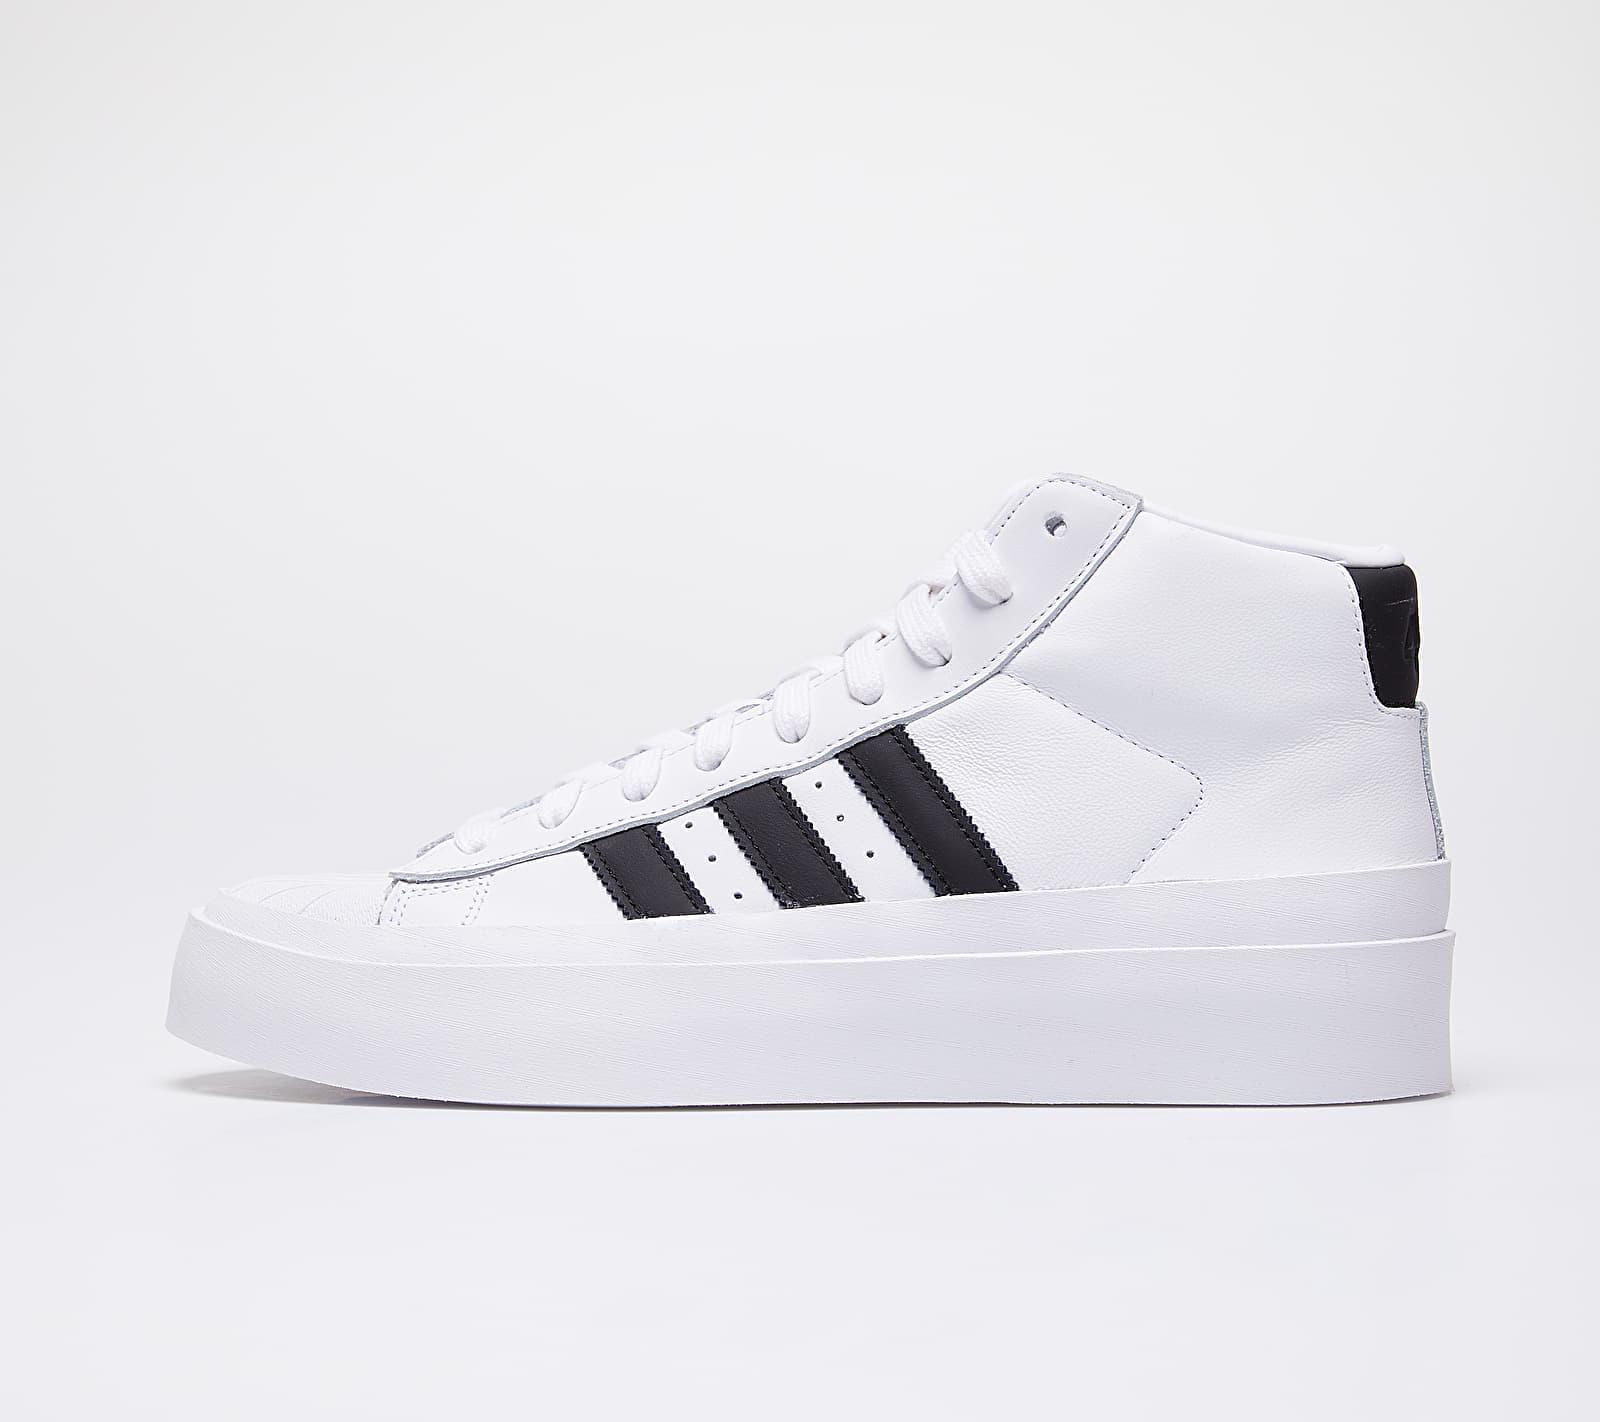 adidas x 424 Pro Model Ftwr White/ Core Black/ Ftwr White EUR 38